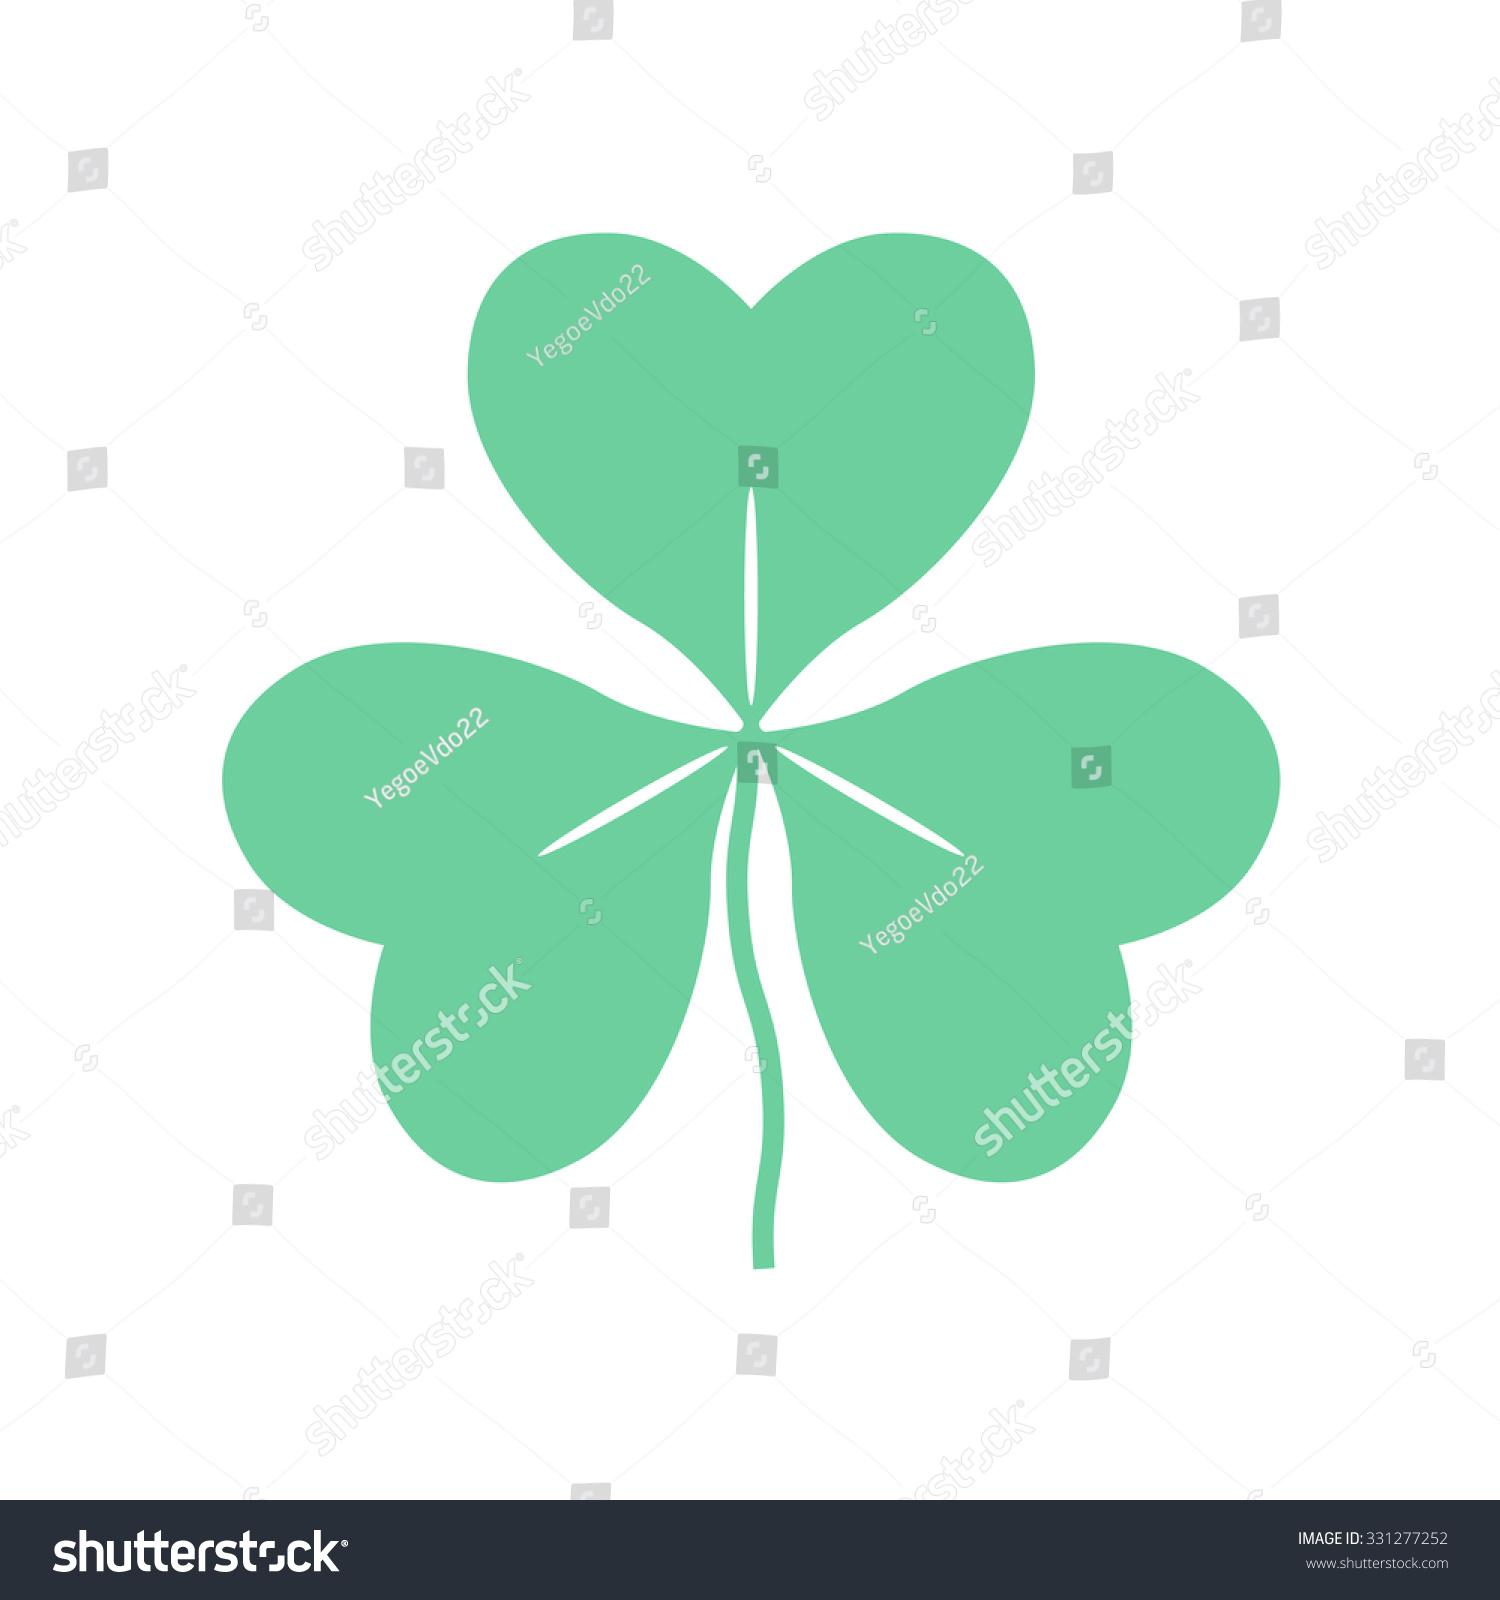 Leaf clover saint patrick symbol stock vector 331277252 shutterstock leaf clover saint patrick symbol biocorpaavc